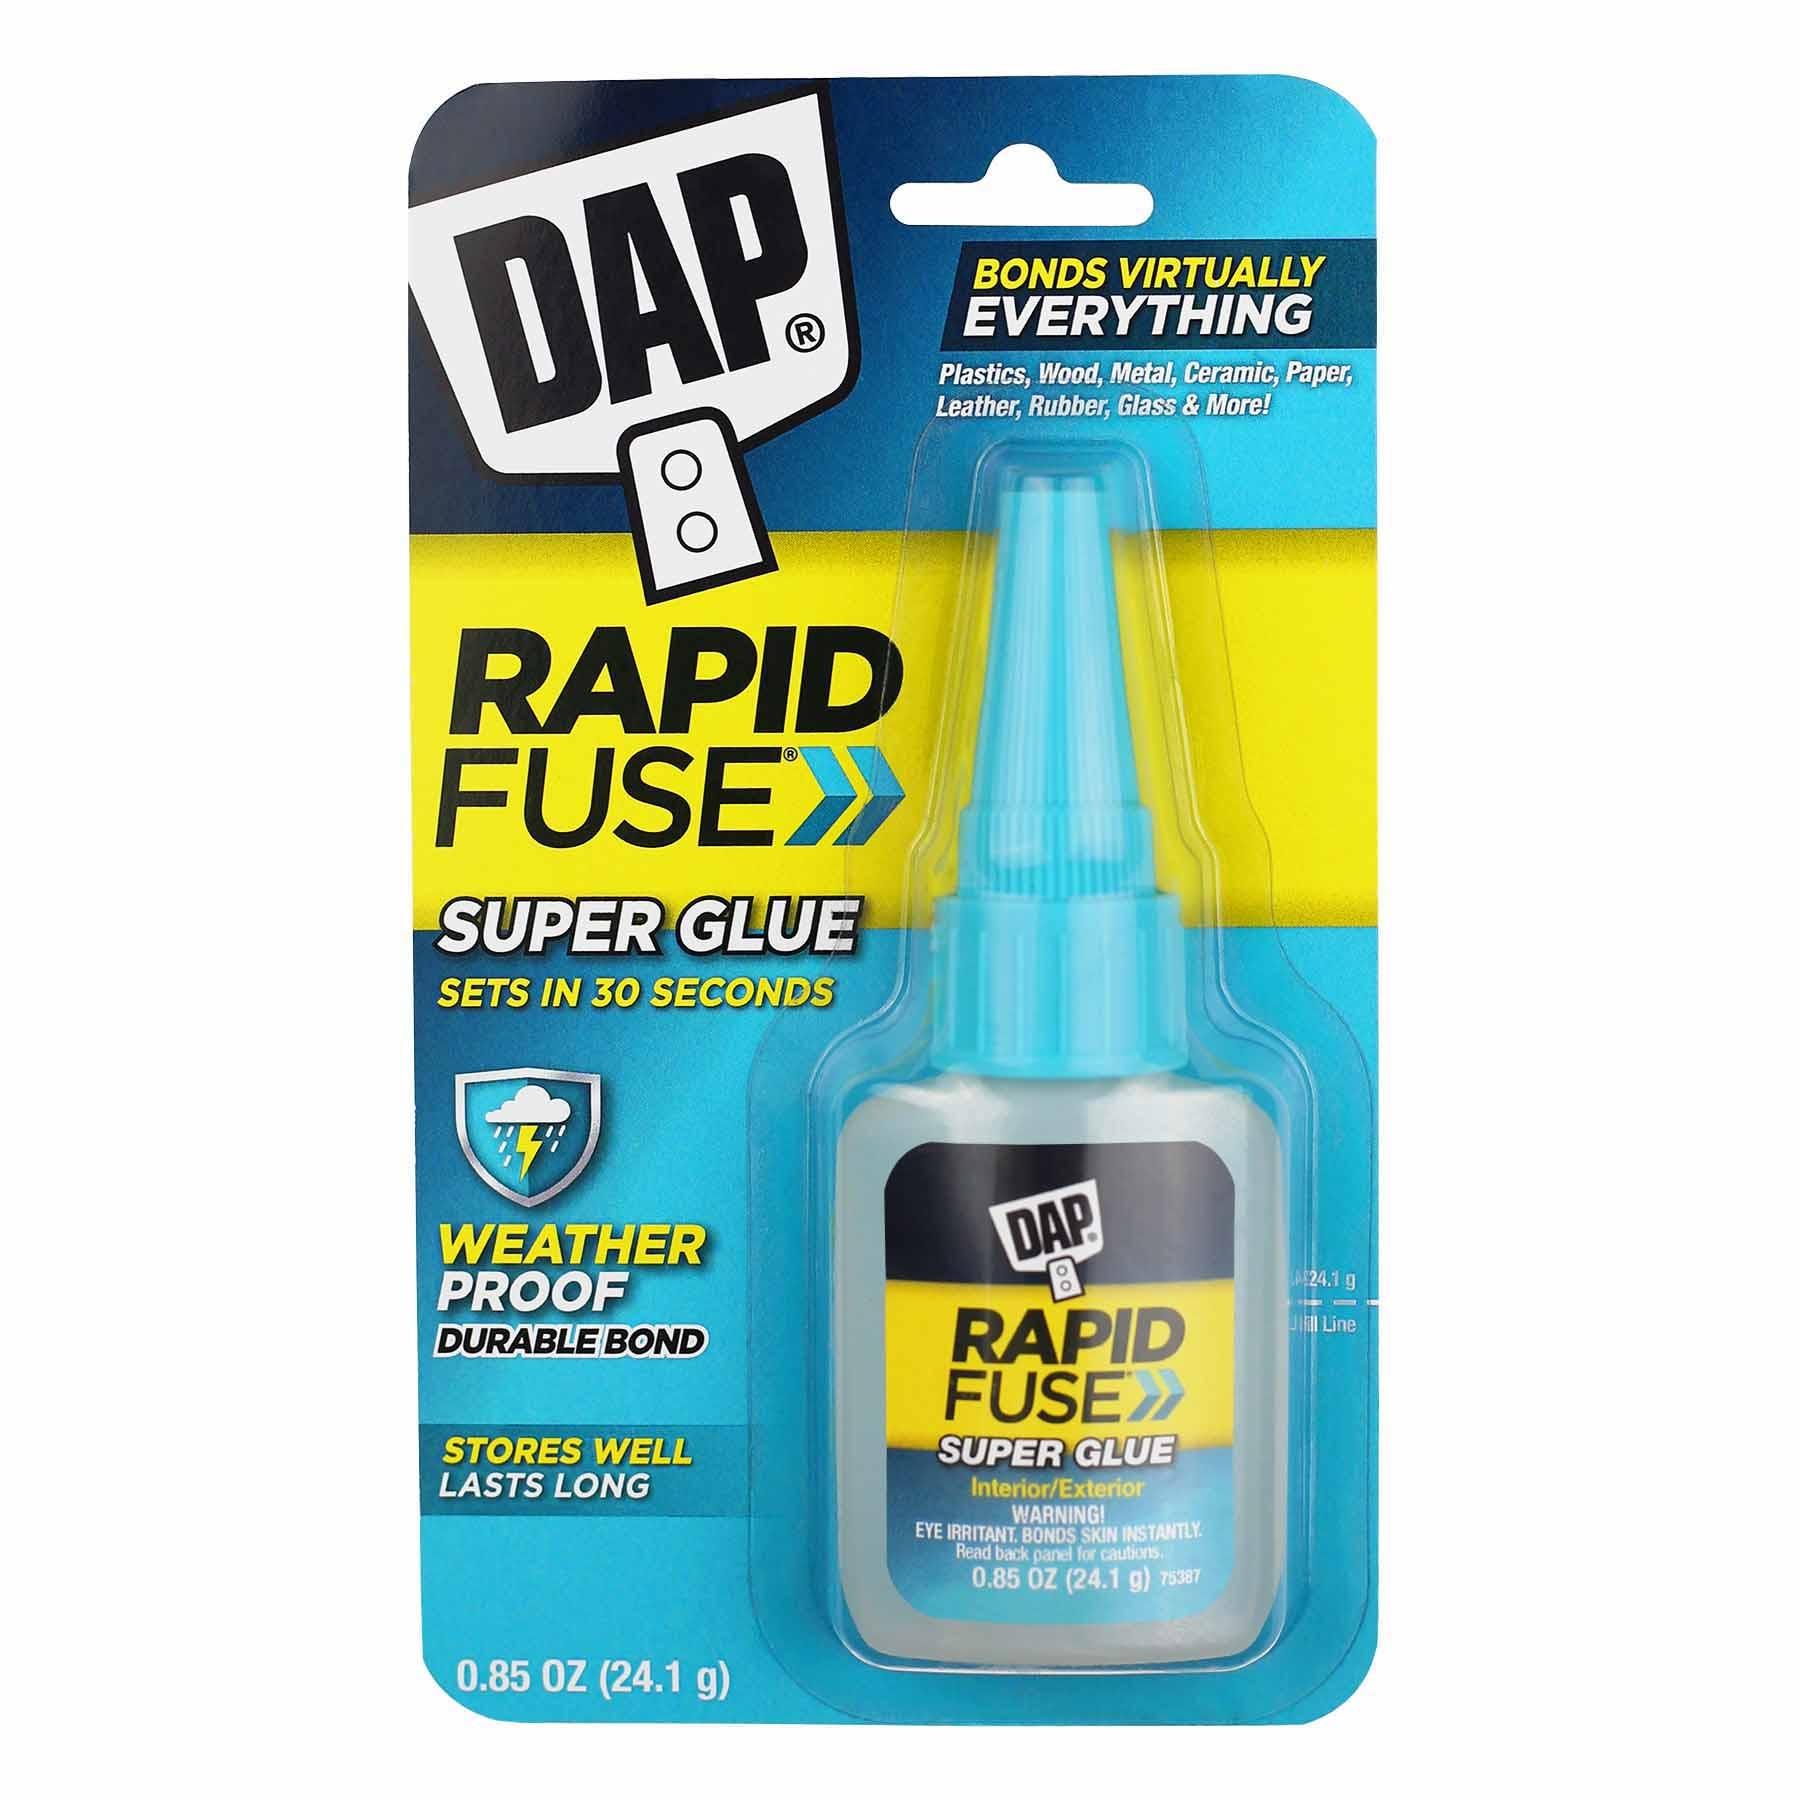 DAP .85OZ CLR -RAPID FUSE ALL PURPS